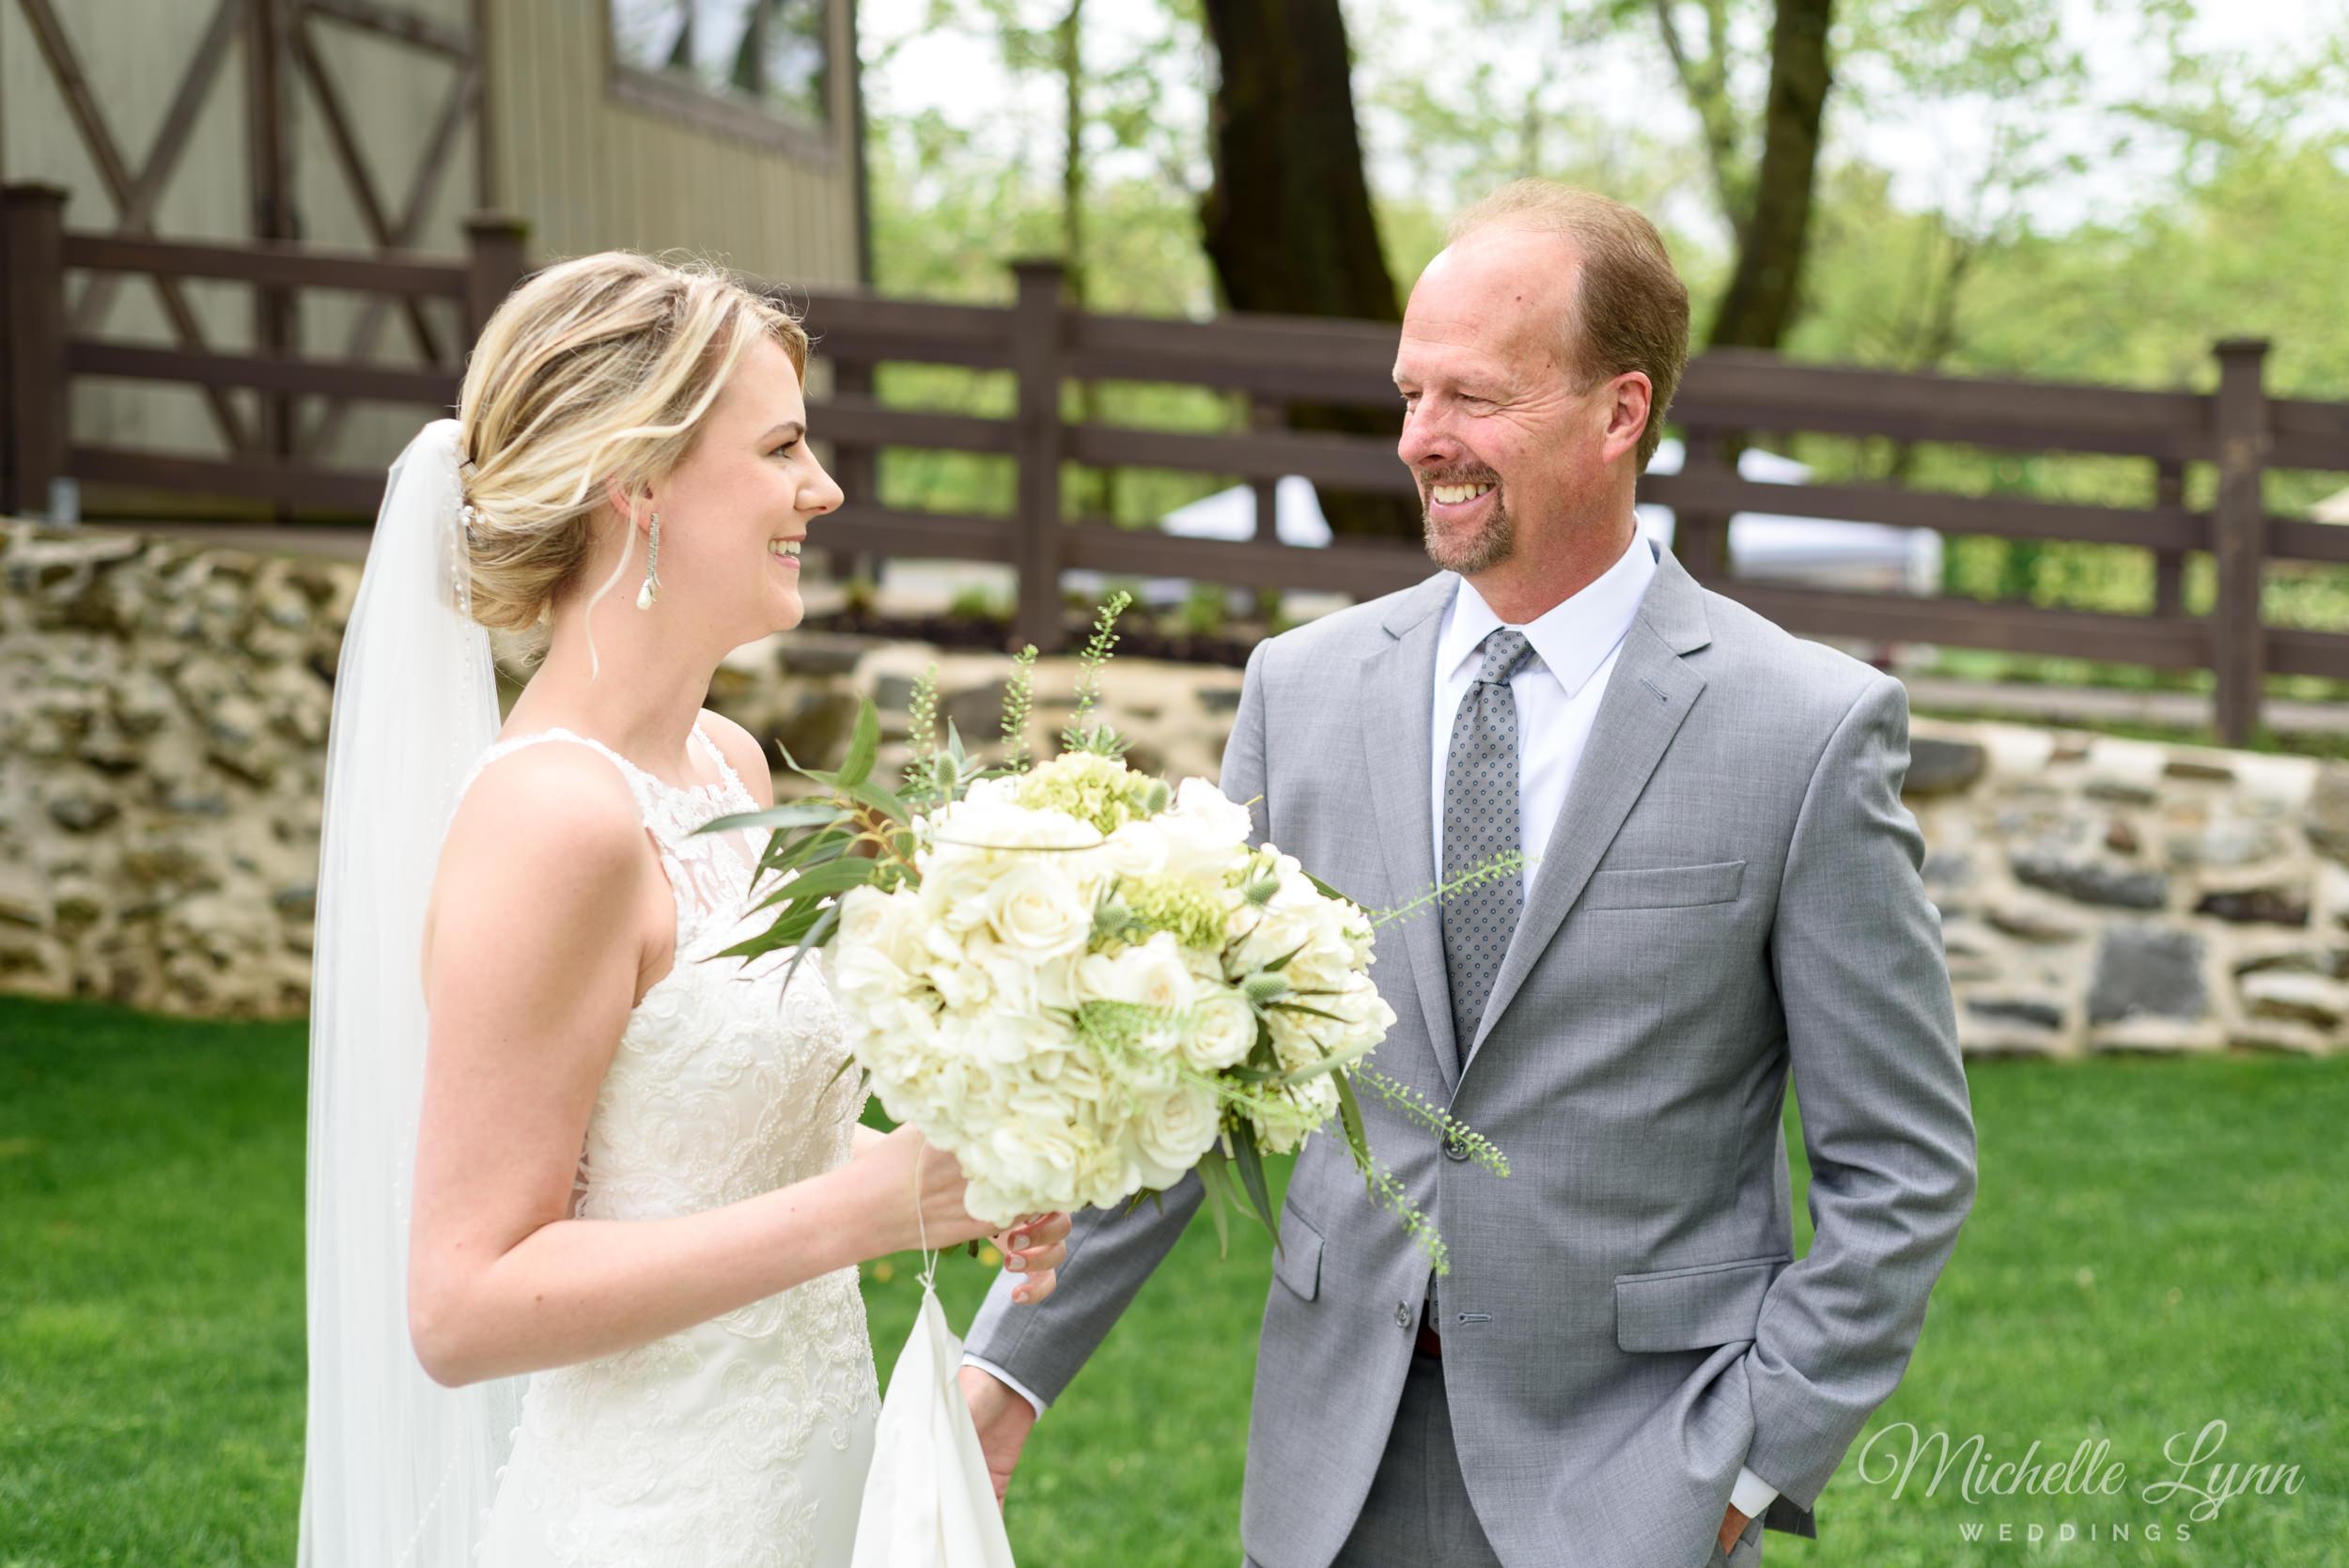 mlw-the-farm-bakery-and-events-wedding-photos-17.jpg